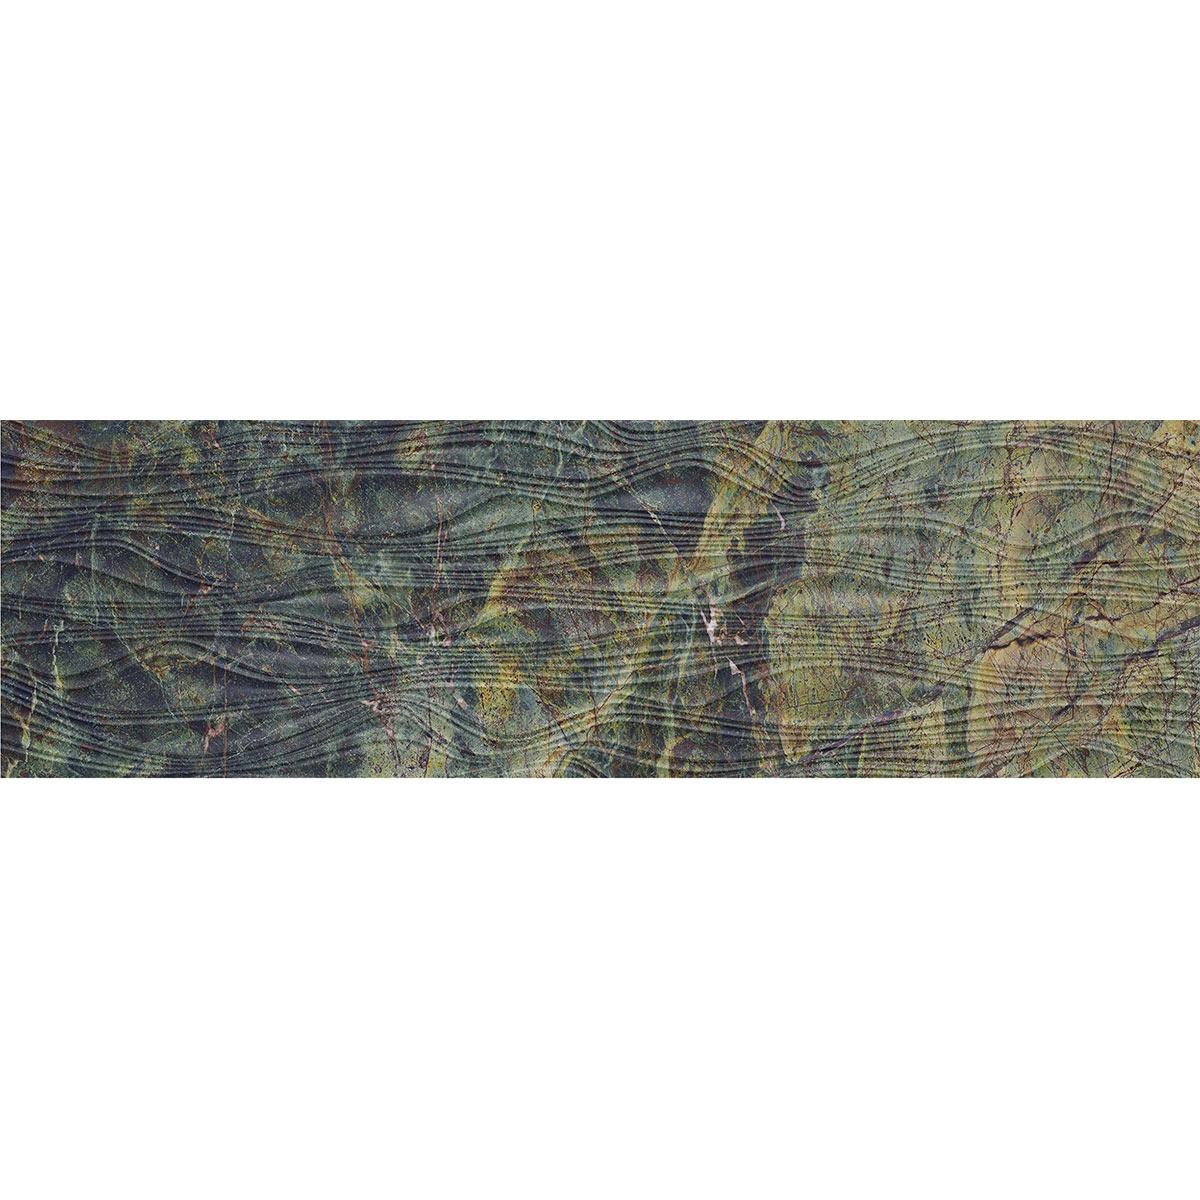 T11121 VIVID GREEN RAINFOREST